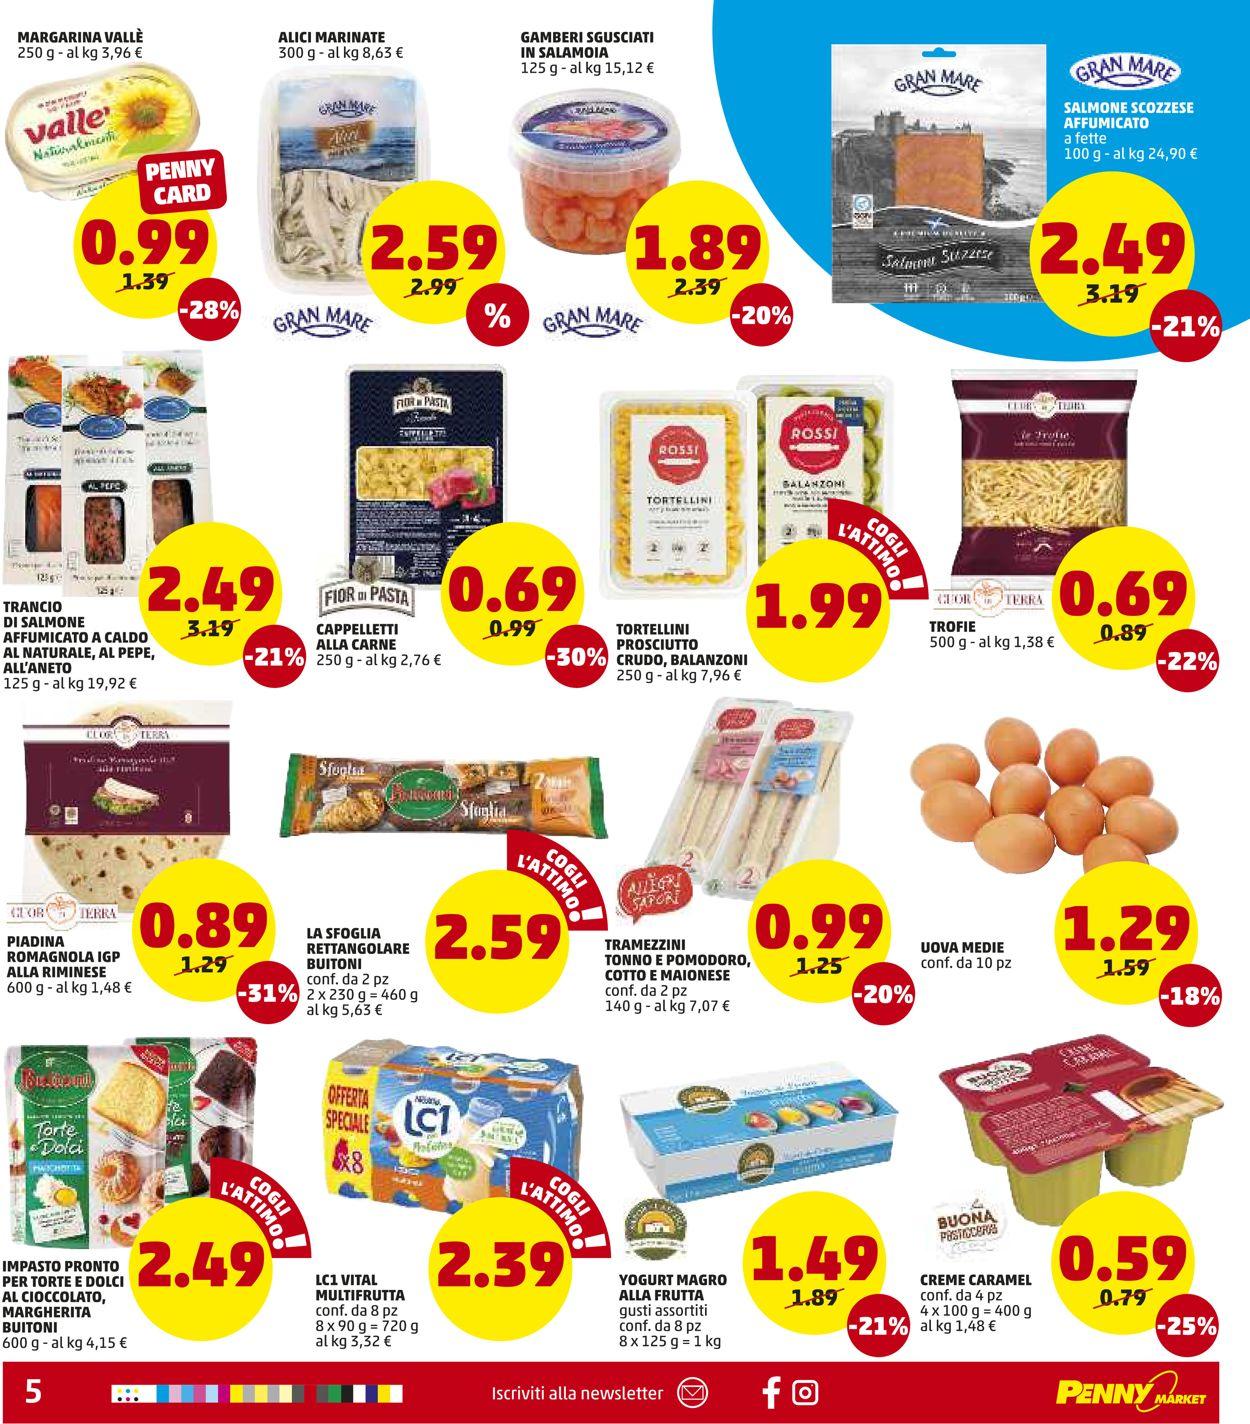 Volantino Penny Market - Offerte 18/03-28/03/2021 (Pagina 5)